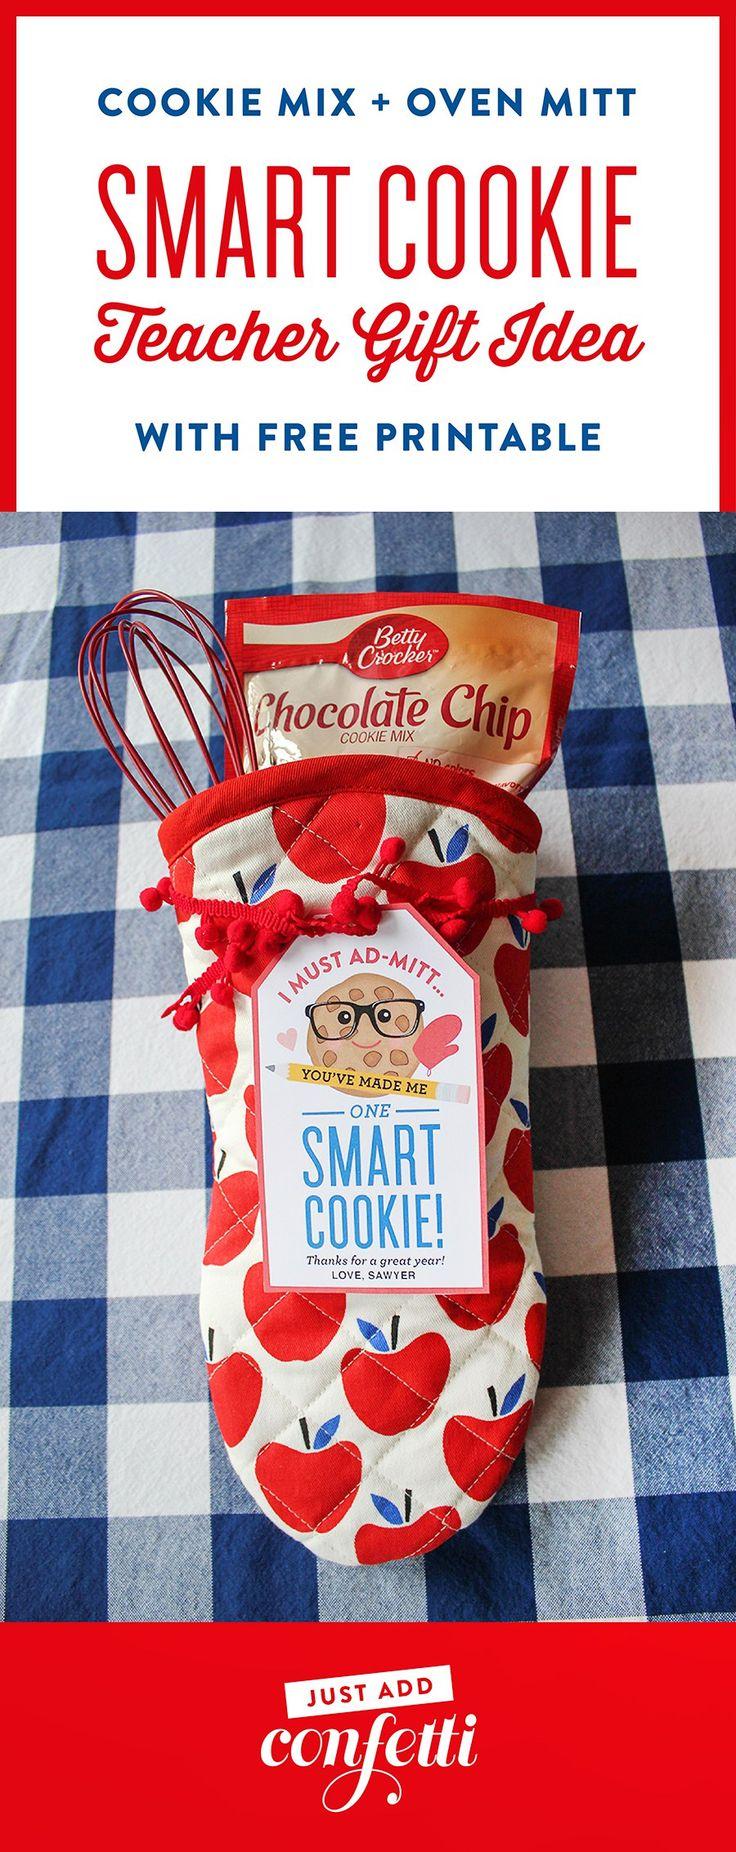 "Oven Mitt ""Smart Cookie"" Teacher Gift IdeaGail Alford"